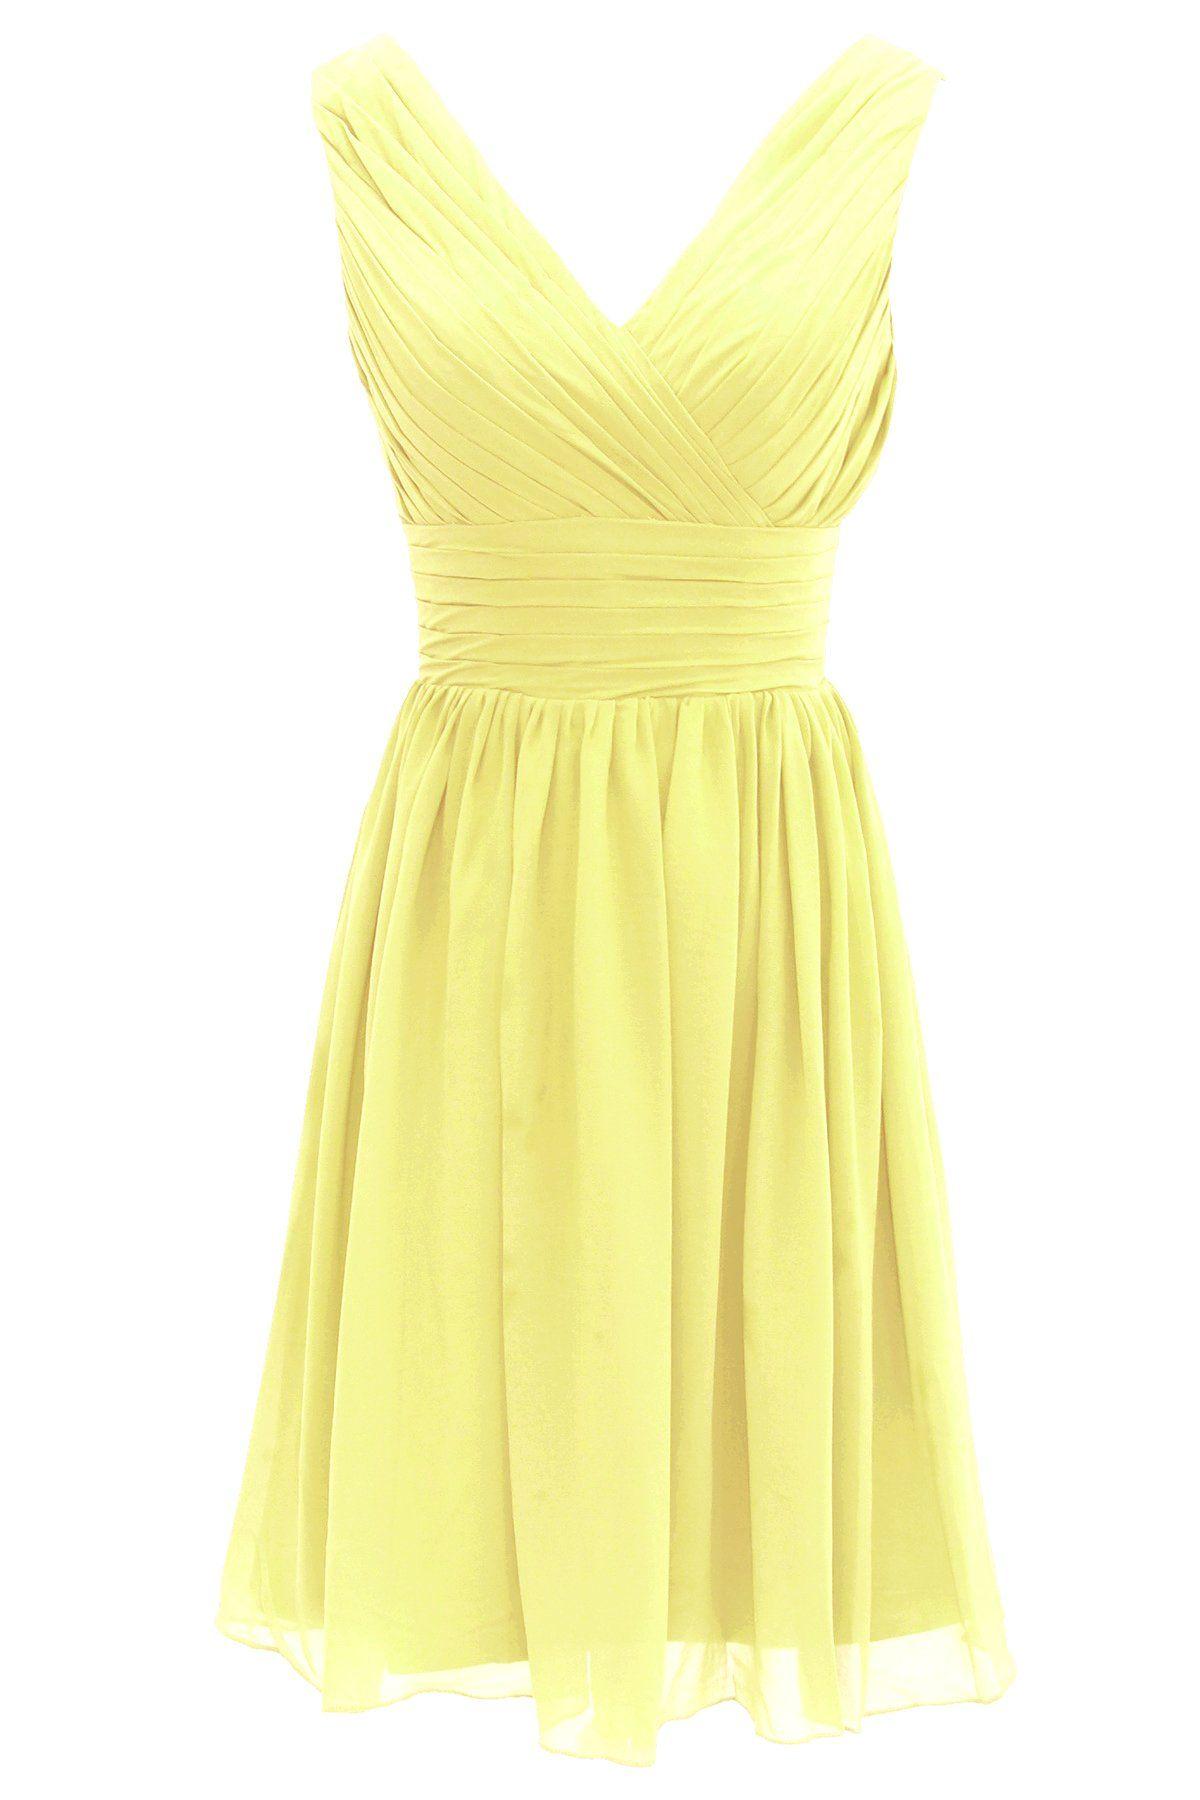 Dressystar short bridesmaid dress chiffon party evening dress yellow